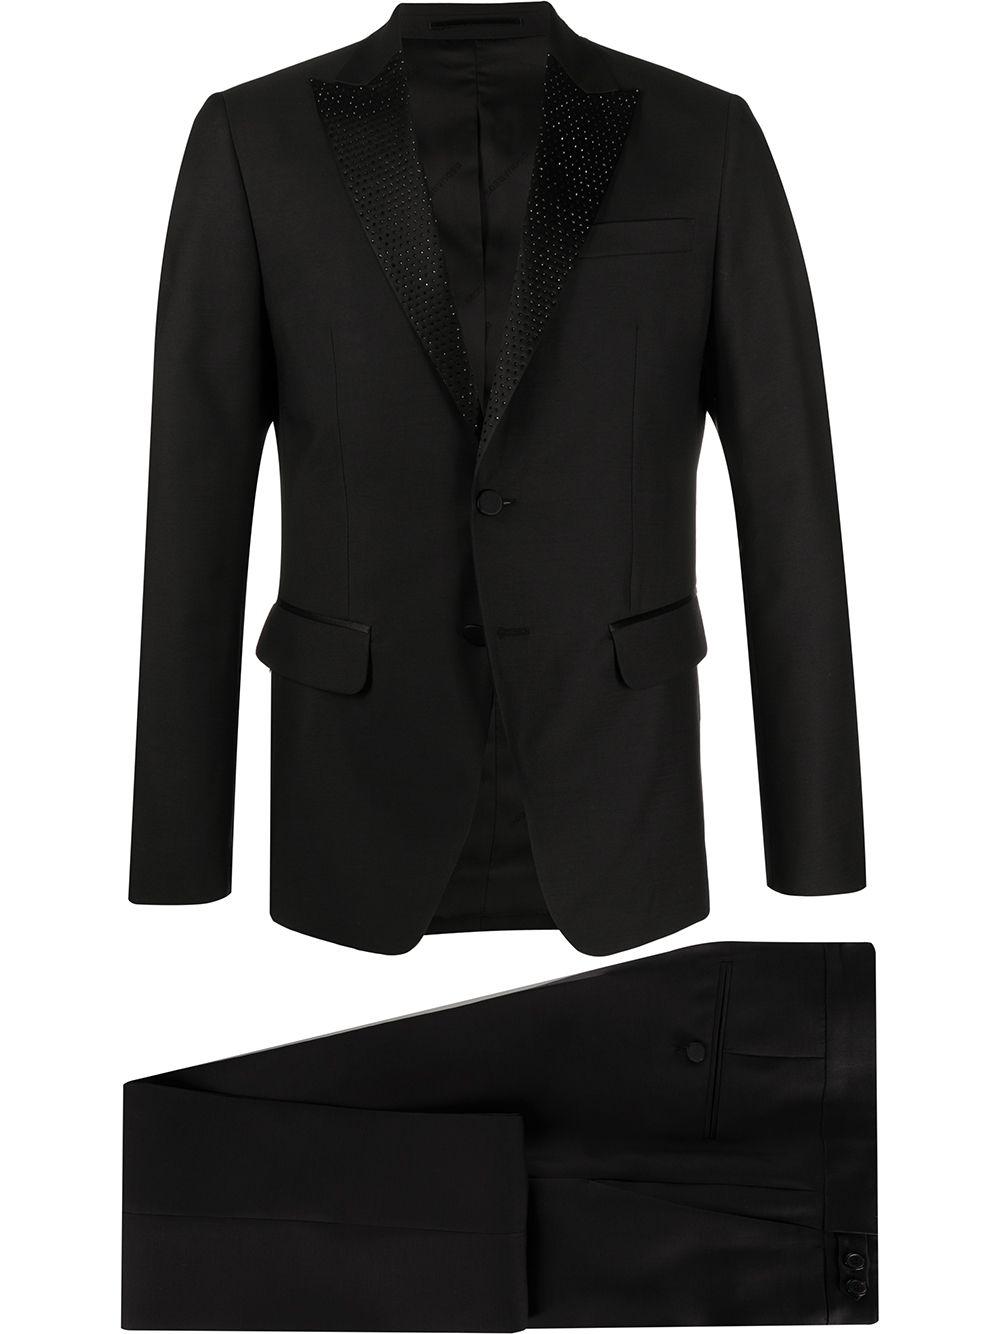 Dsquared2 formal suit - Black